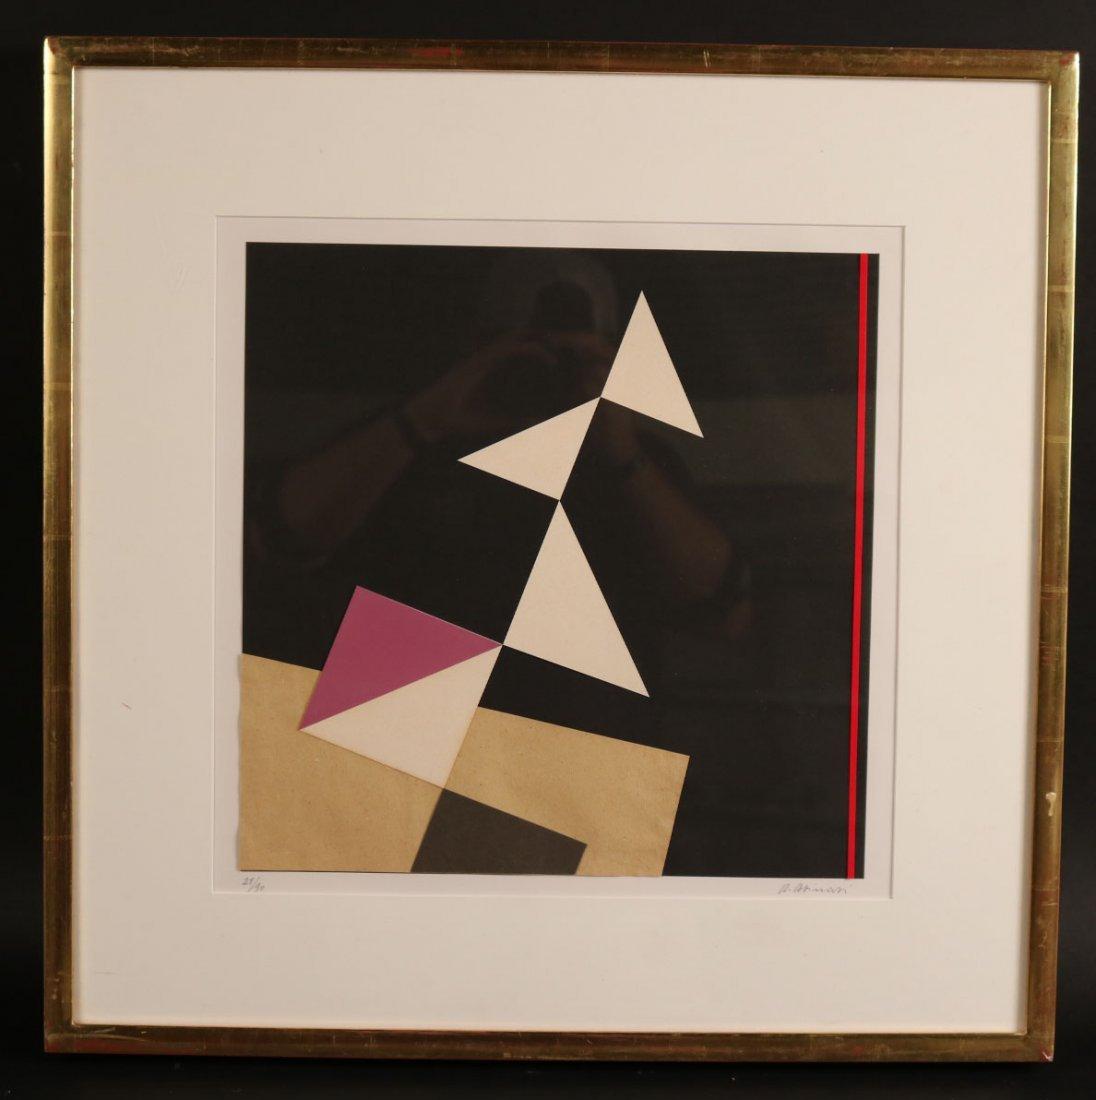 Collage, Shapes on Black Paper, Adone Asinari